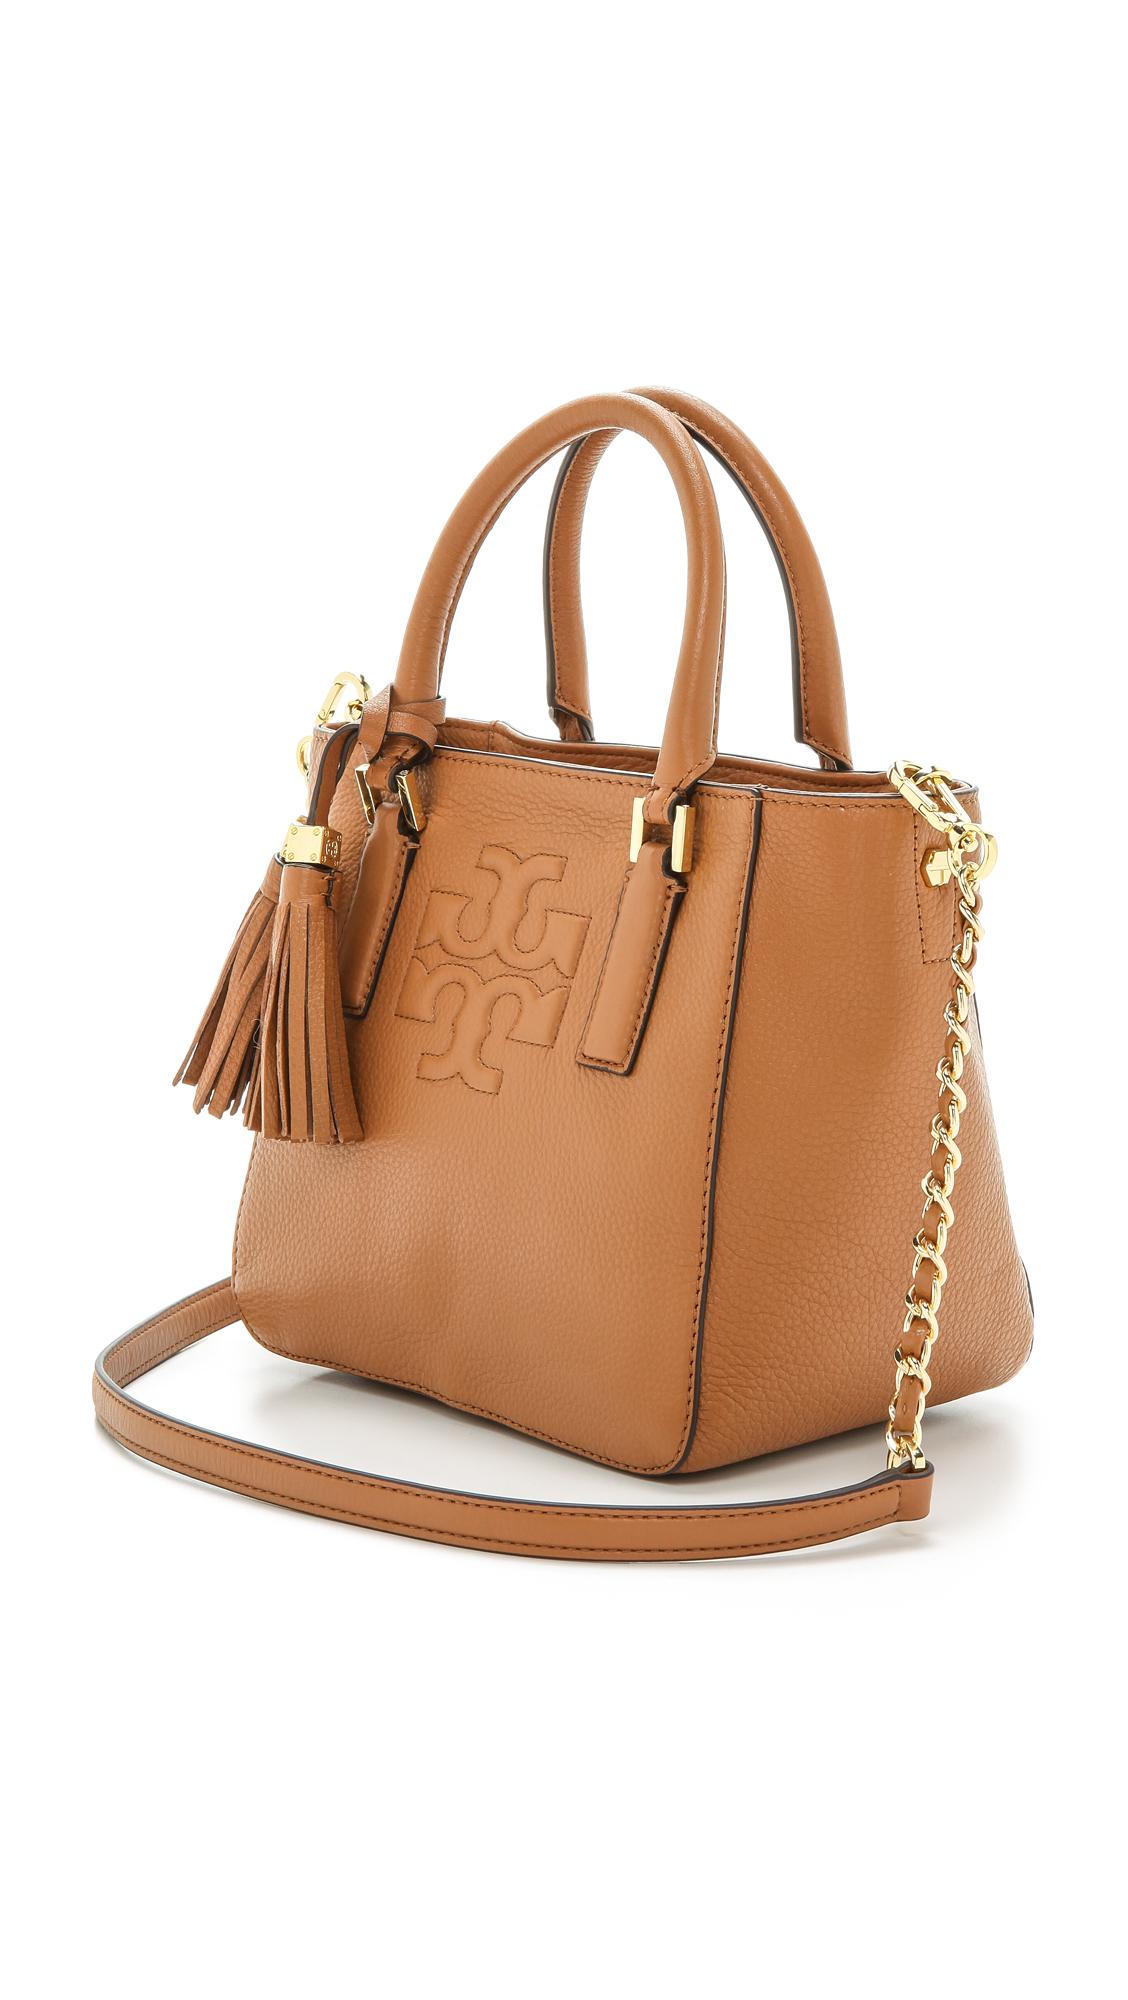 b04bc8cbab3 Tory Burch Thea Mini Bucket Bag - Bark in Brown - Lyst